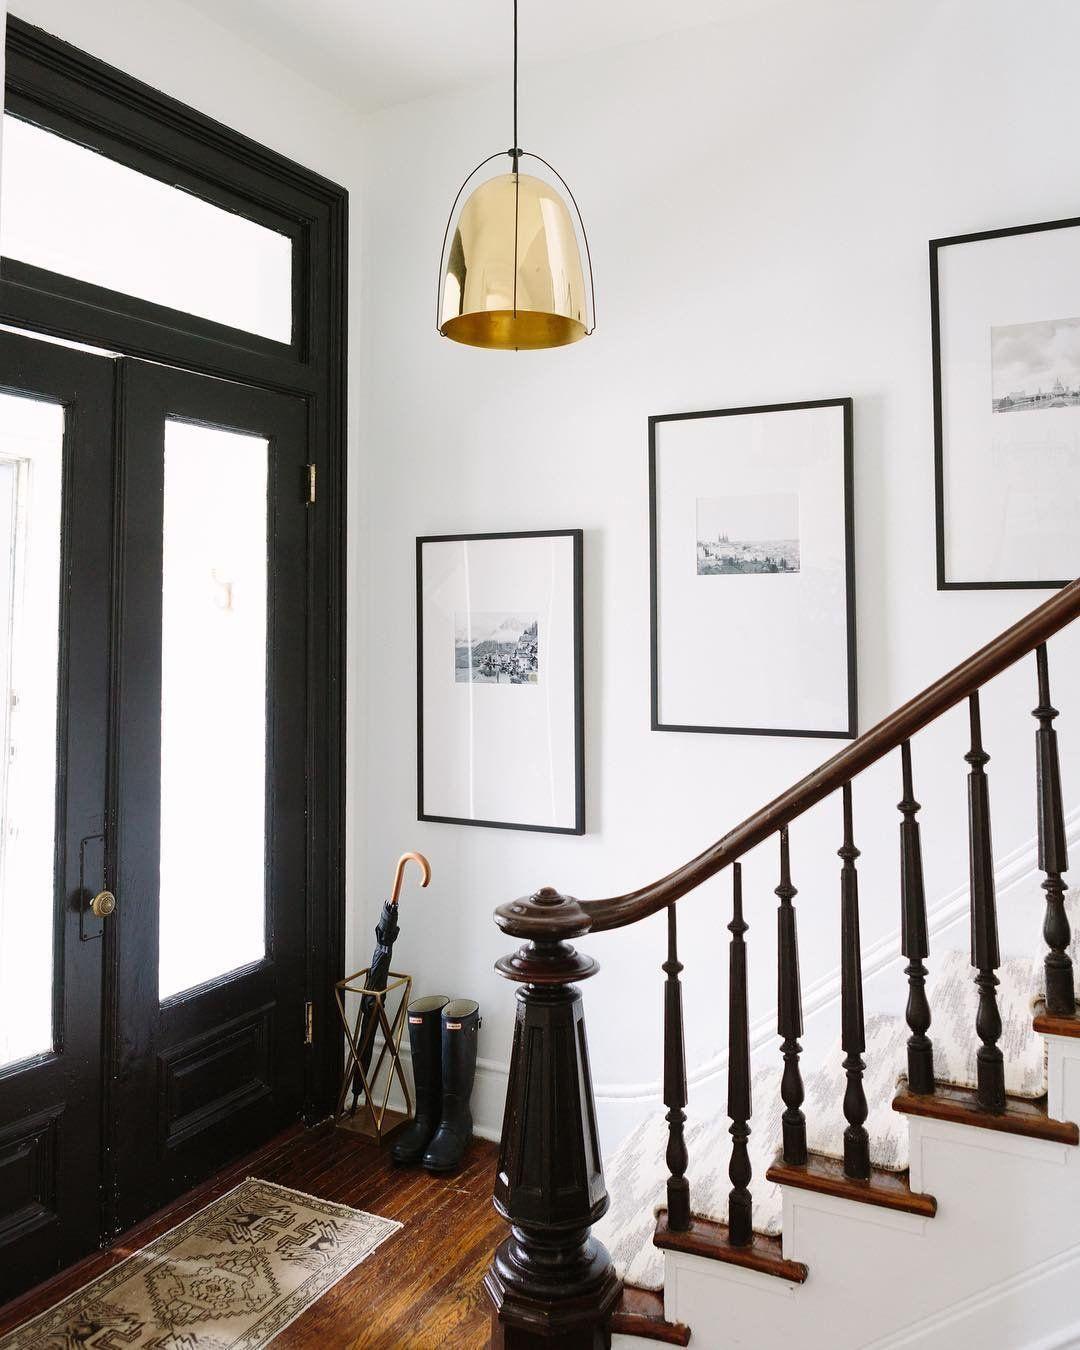 industrial inspired lighting. Industrial Inspired Lighting. Brass And Black Pendant. Chicago Apartment. Style. Alaina Kaczmarski Home Tour. Lighting G